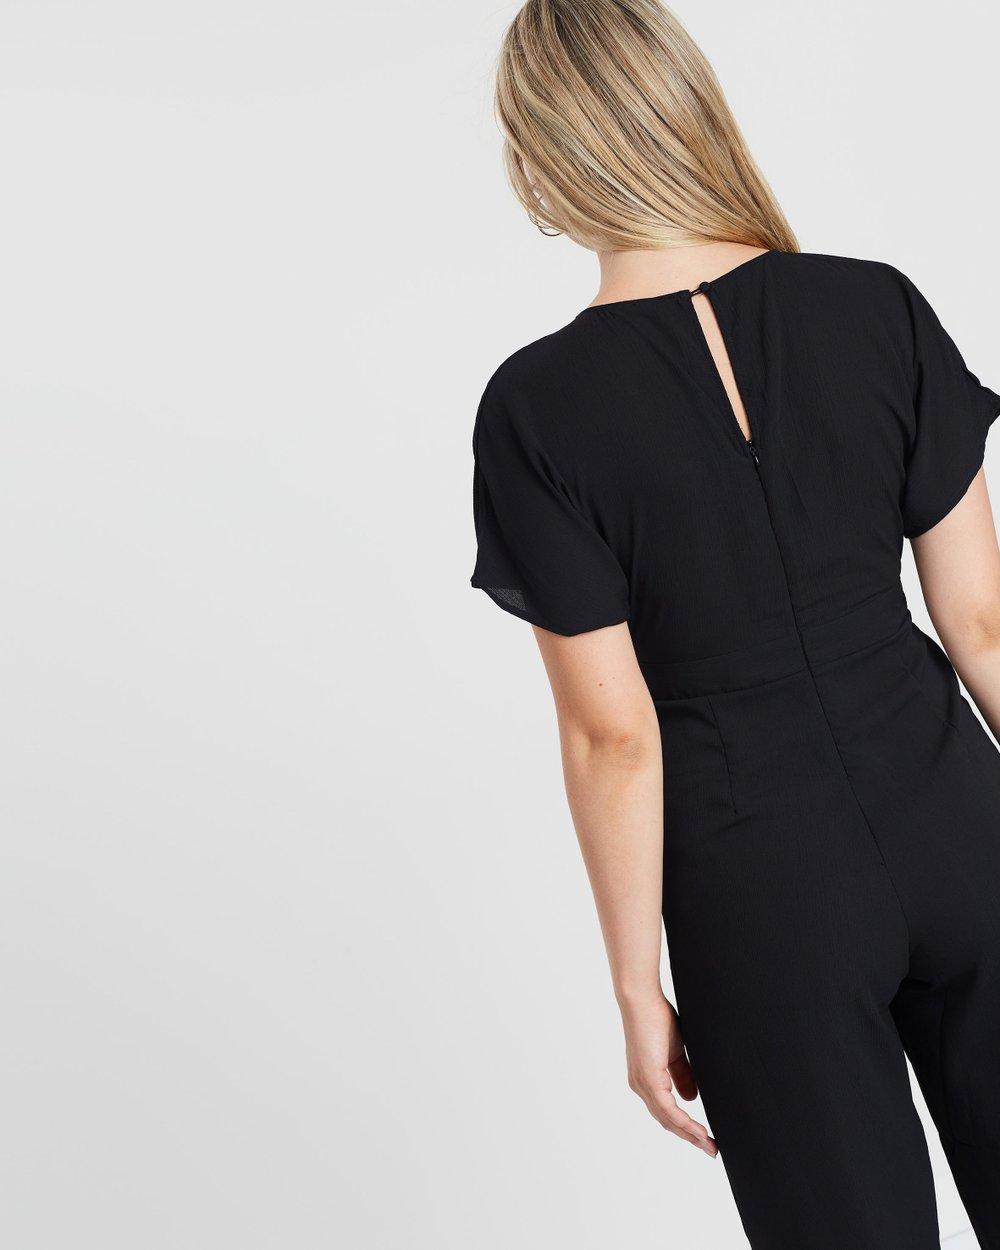 8f28c026d5a8 Woven Nova Batwing Jumpsuit by Cotton On Online